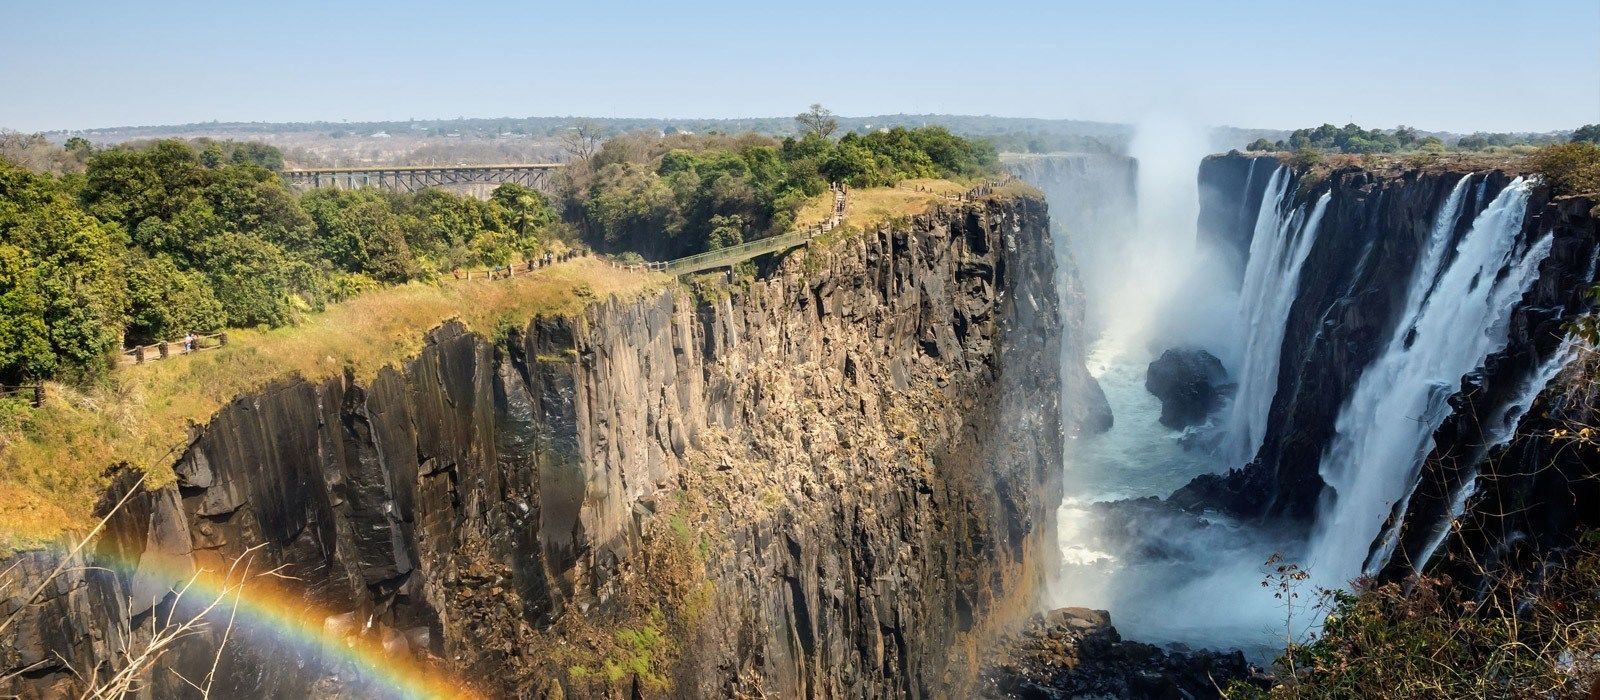 Tanzania and Botswana Safari Highlights Tour Trip 5